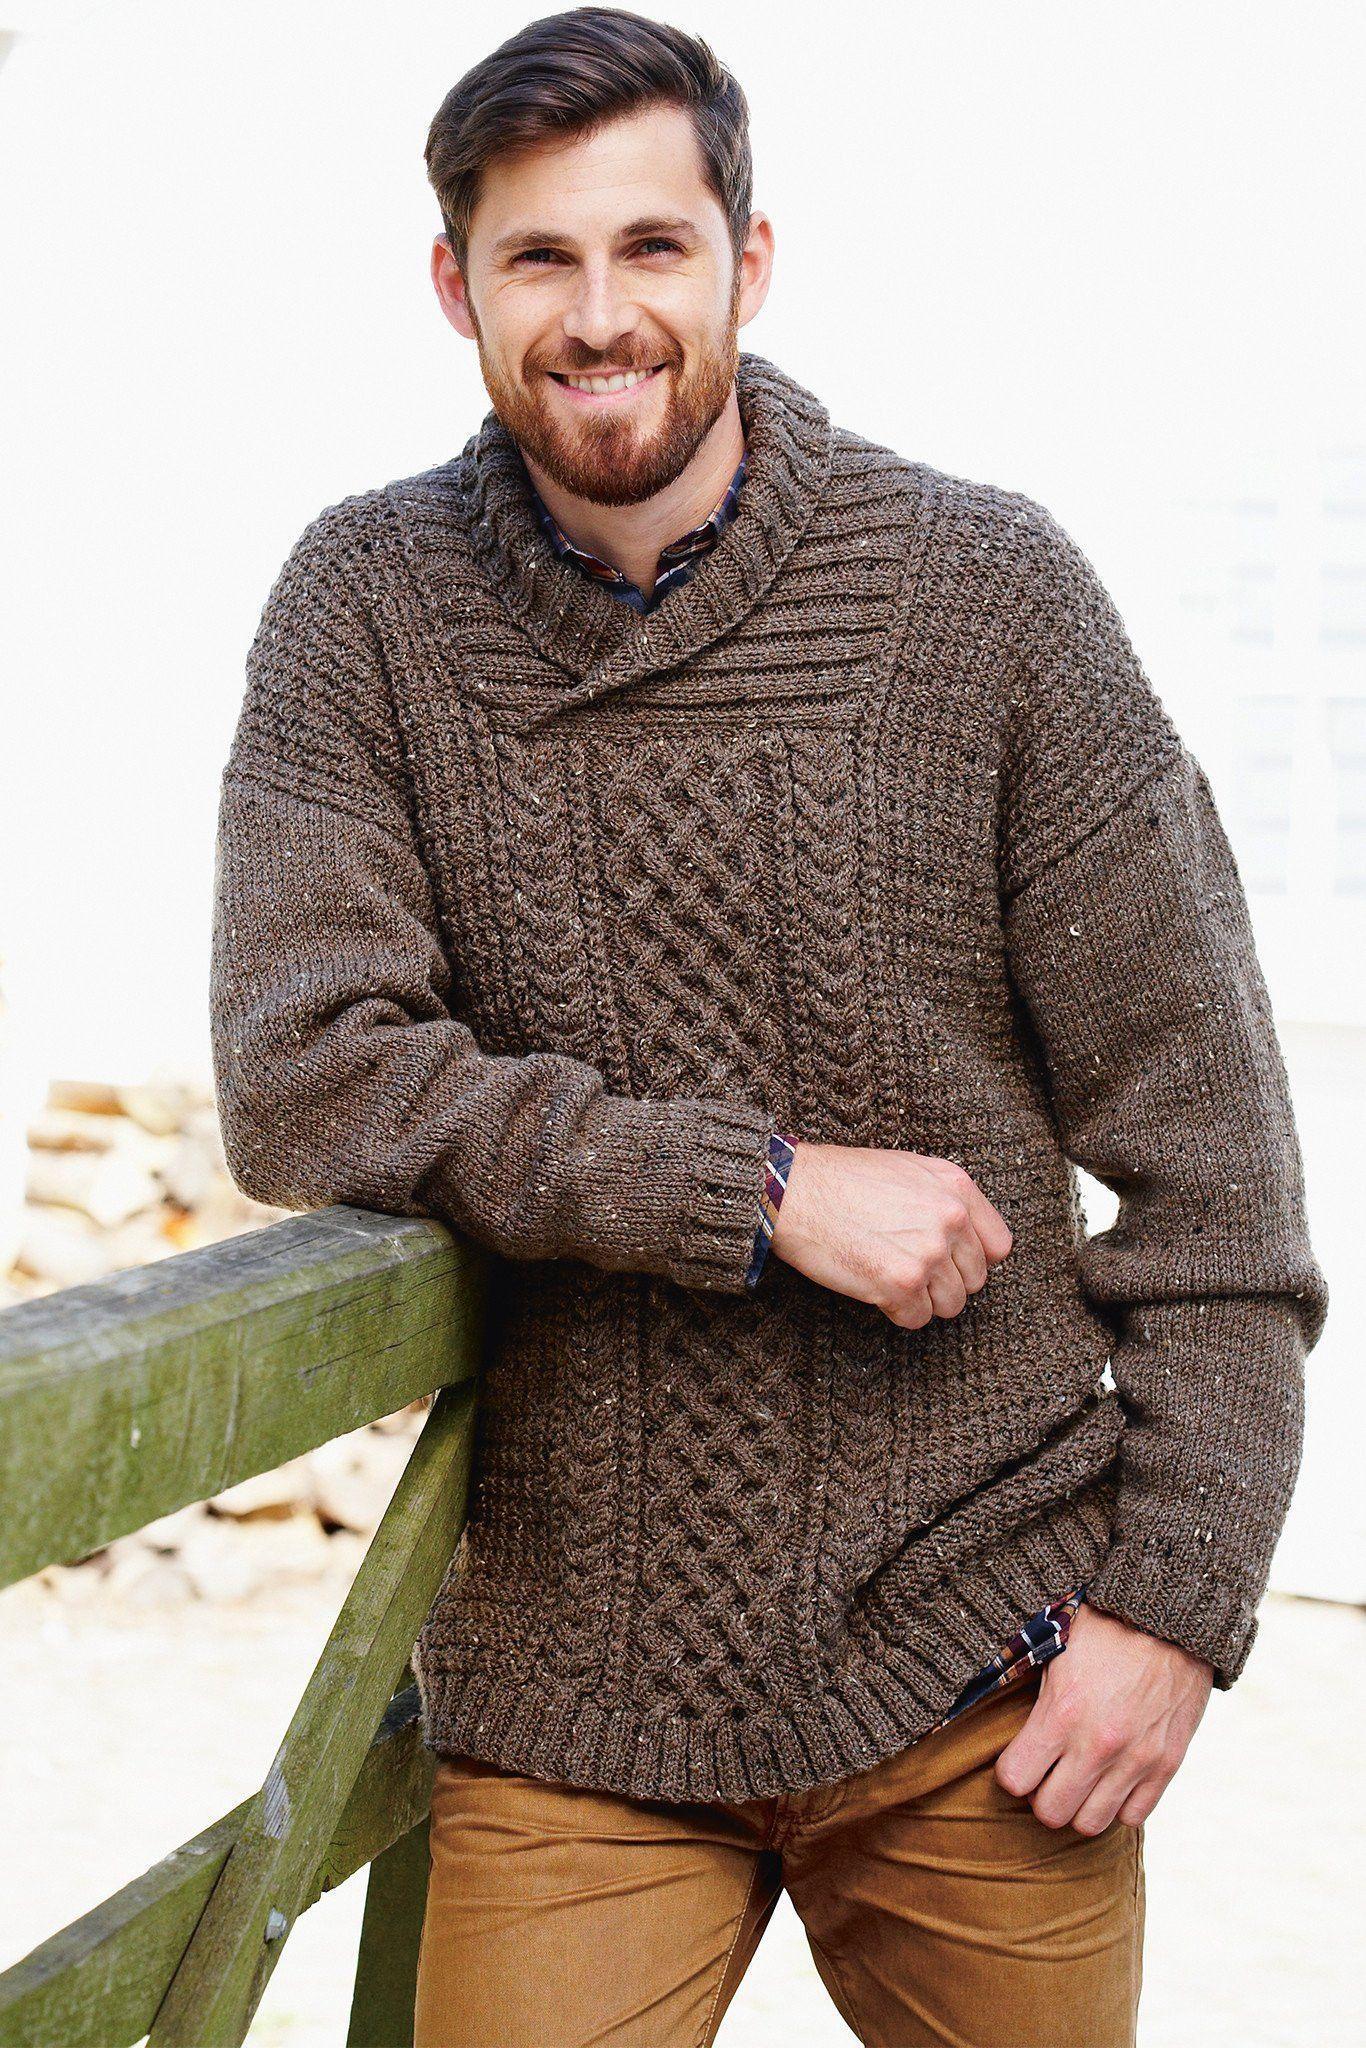 Mens Aran Sweater Knitting Pattern | The Knitting Network